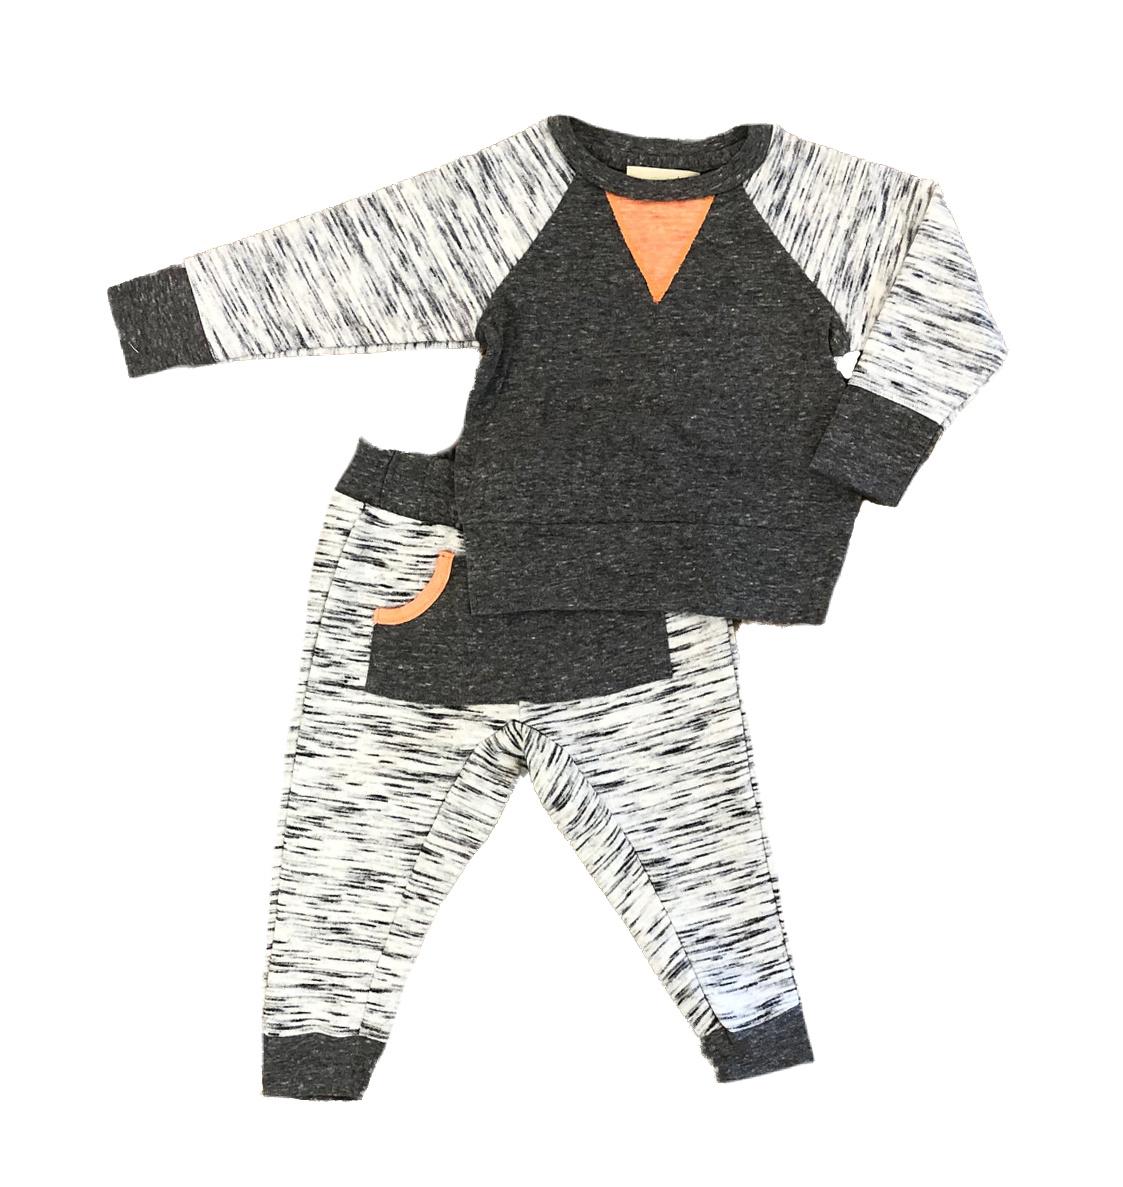 Miki Miette Grey Variegated Pant Set